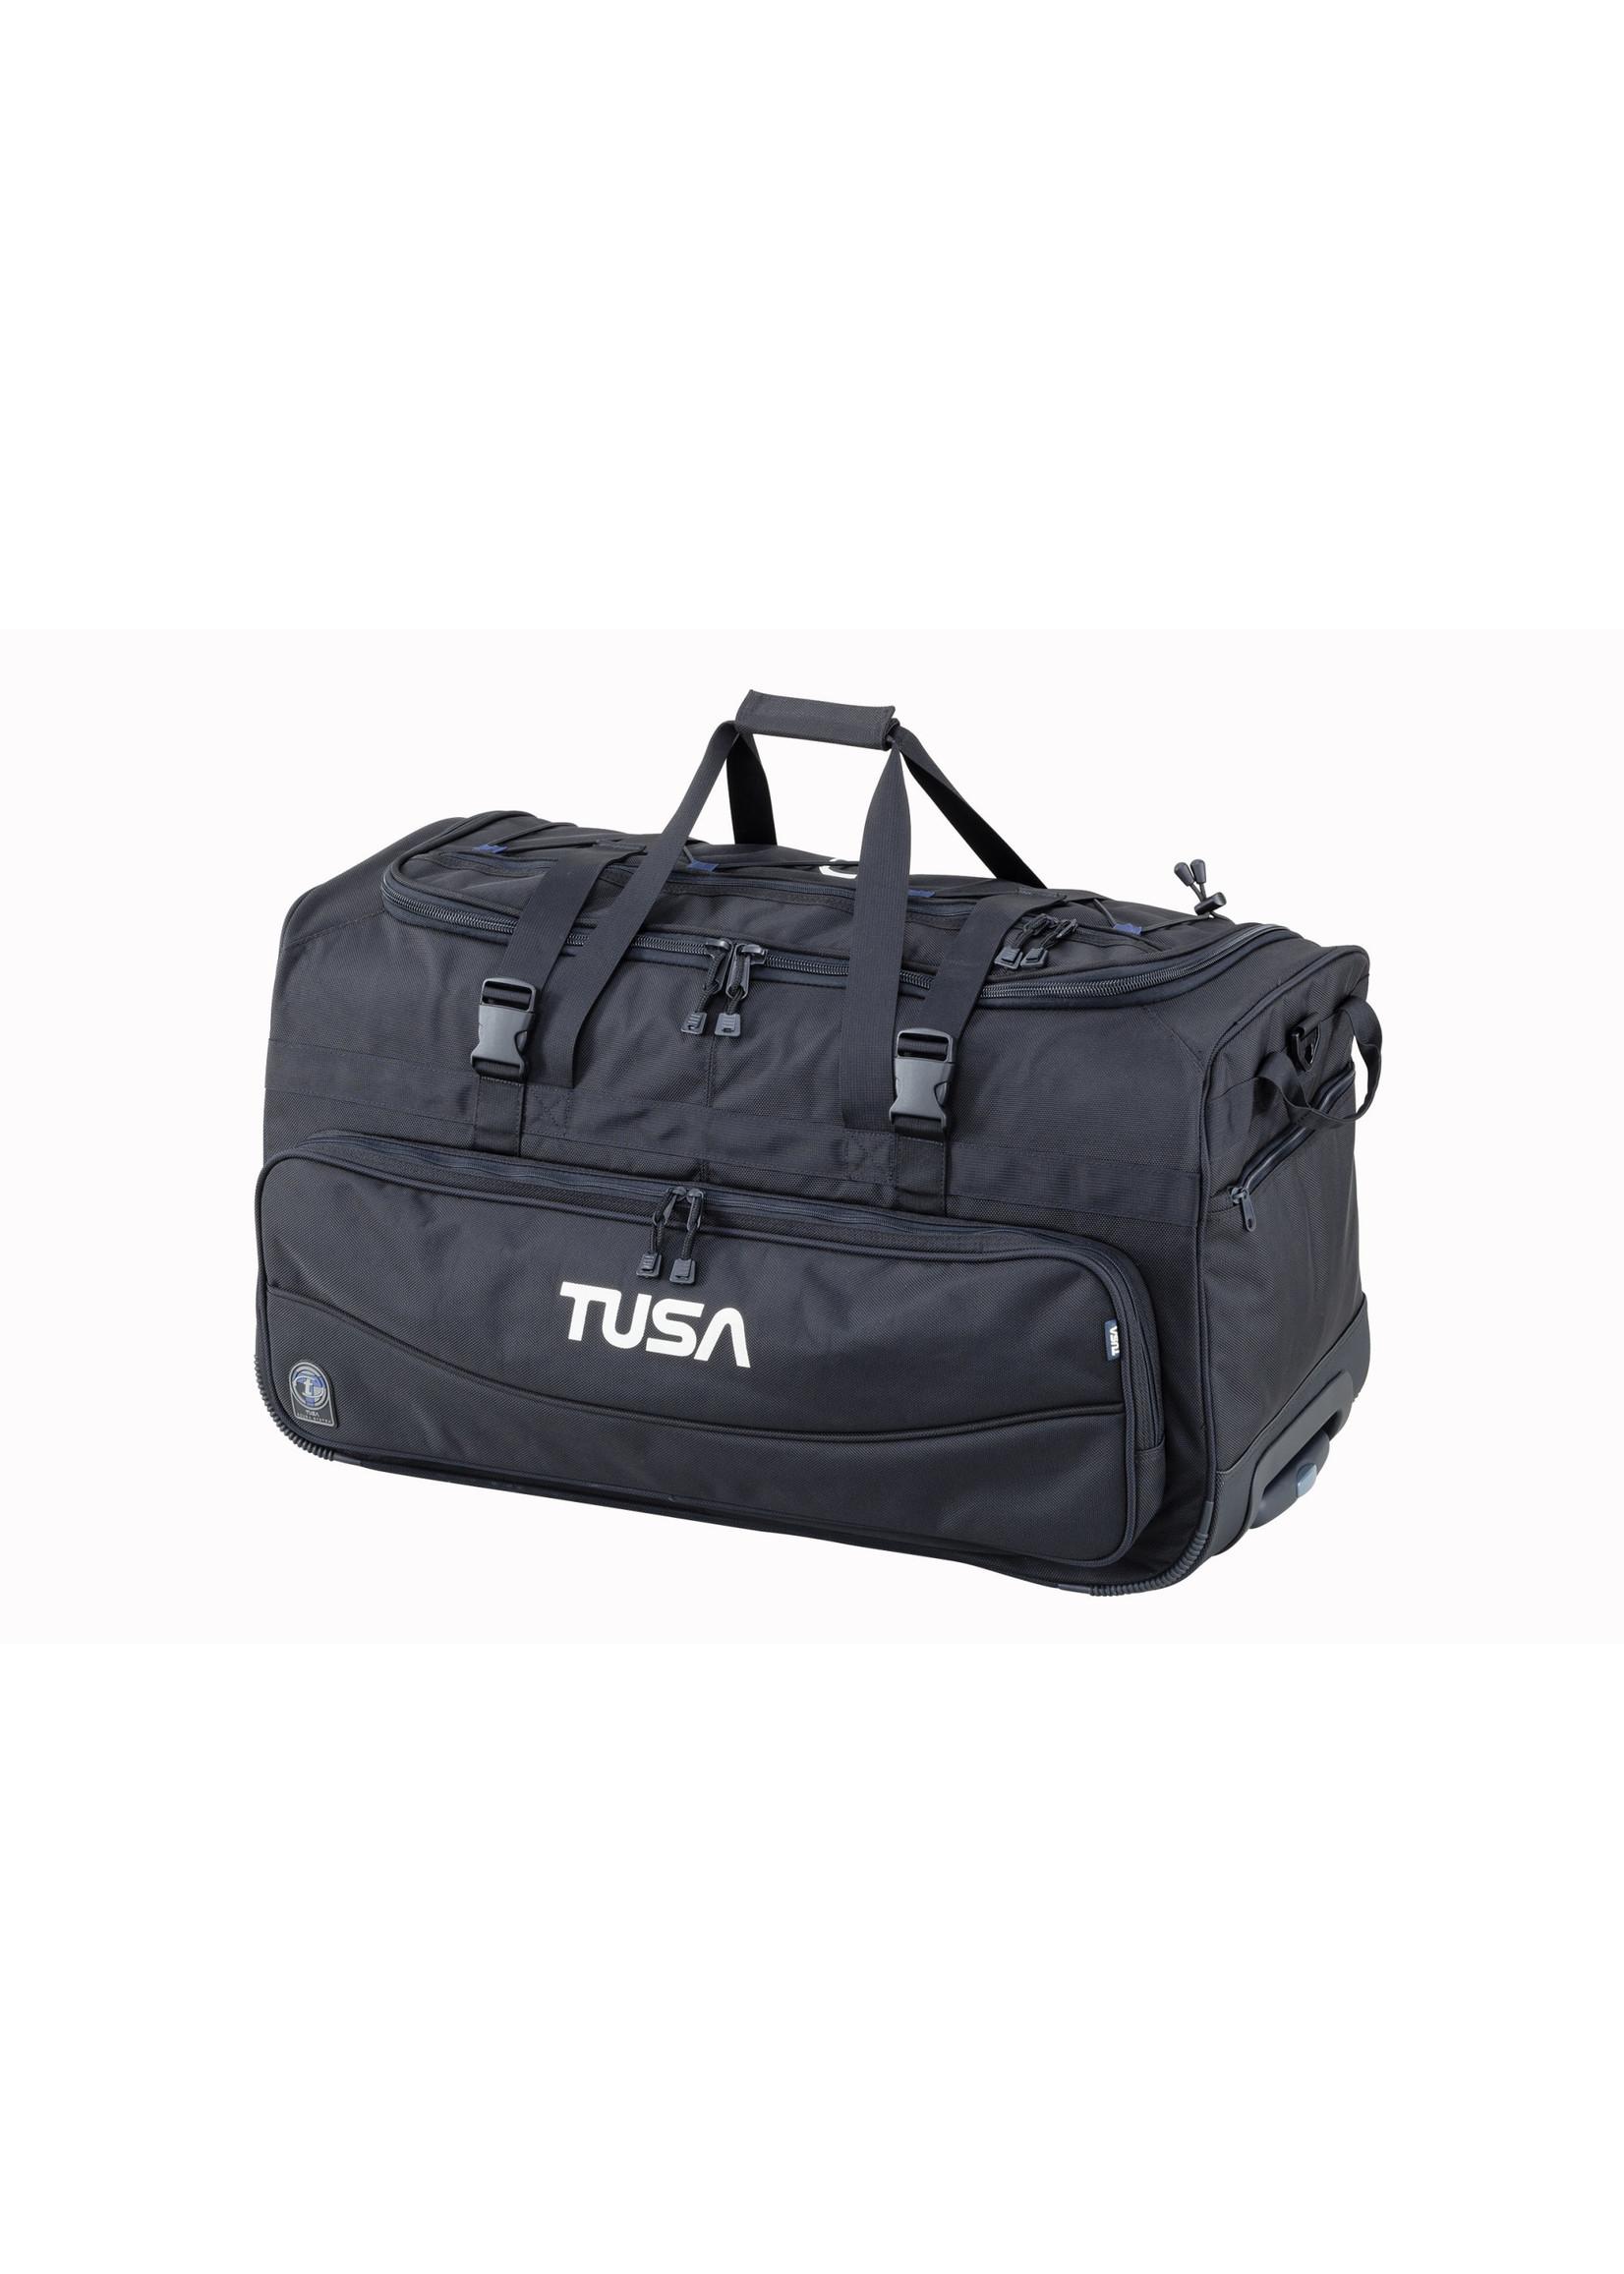 TUSA TUSA Roller Duffel Bag 90L